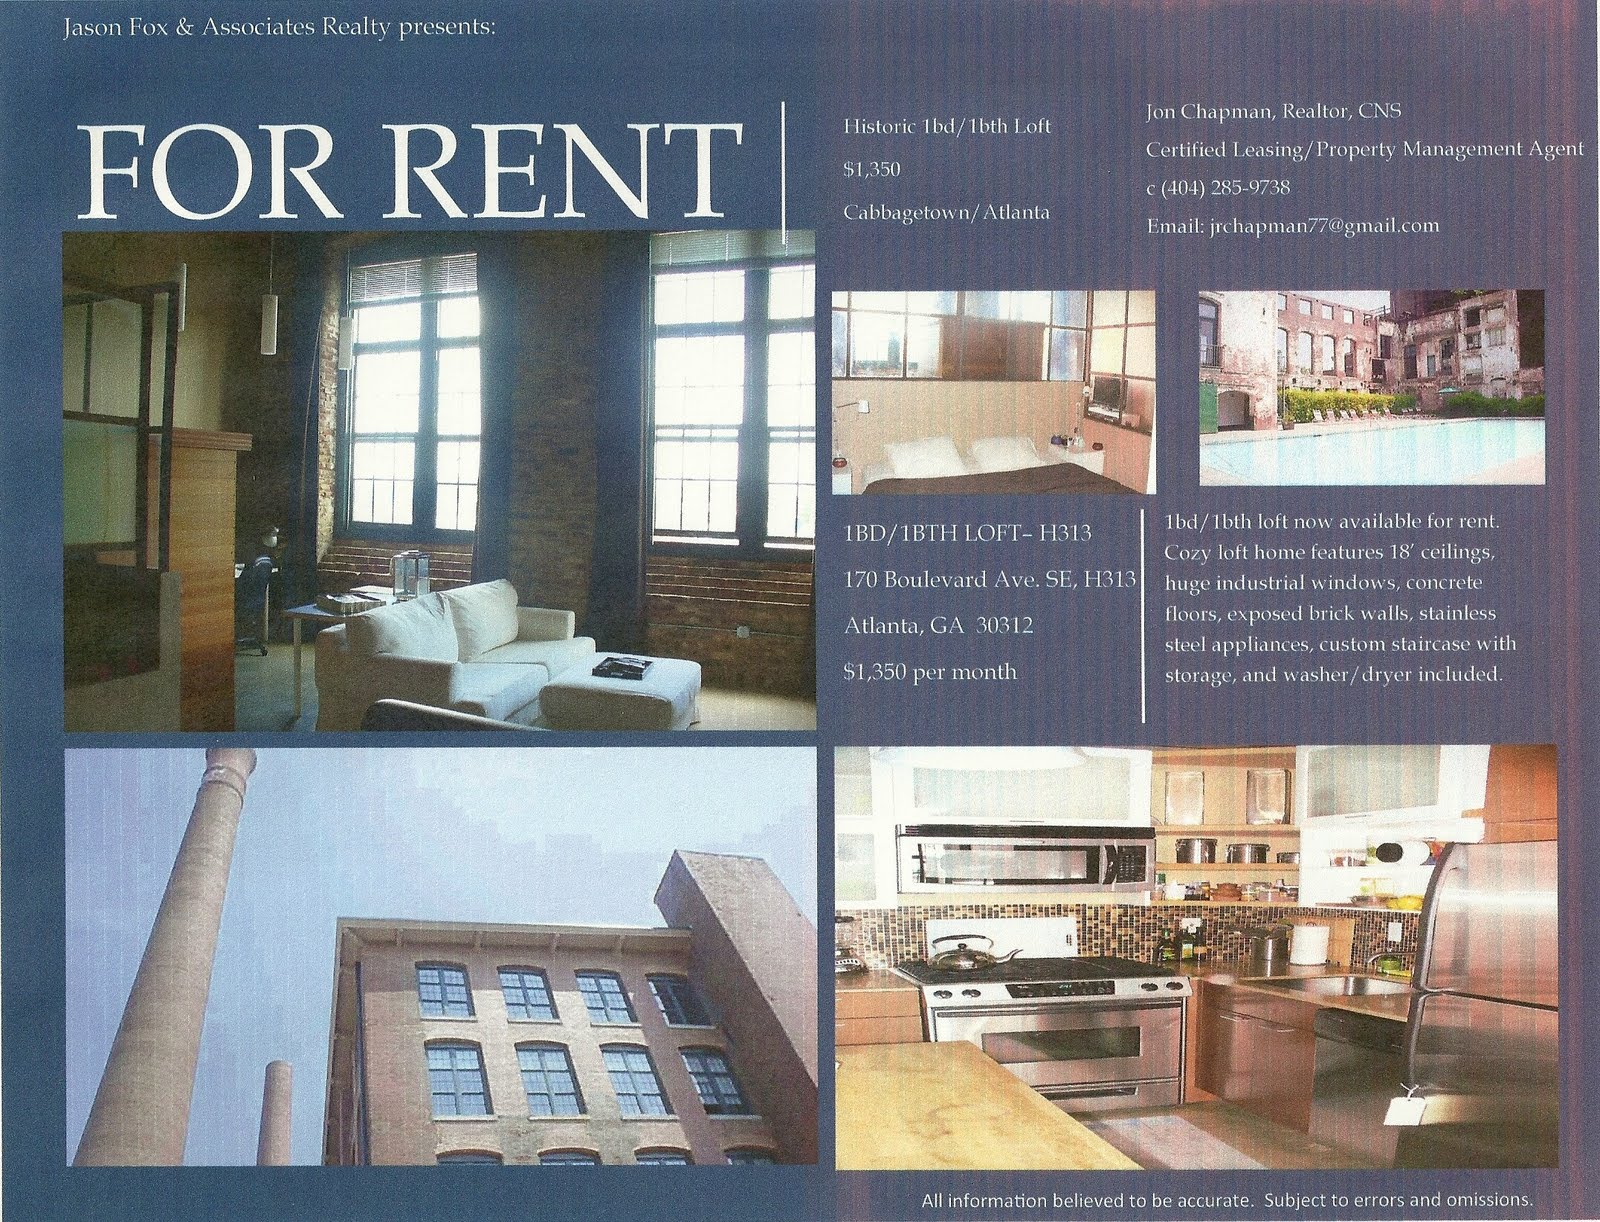 Atlanta Real Estate Leased 1bd 1bth Historic Loft At